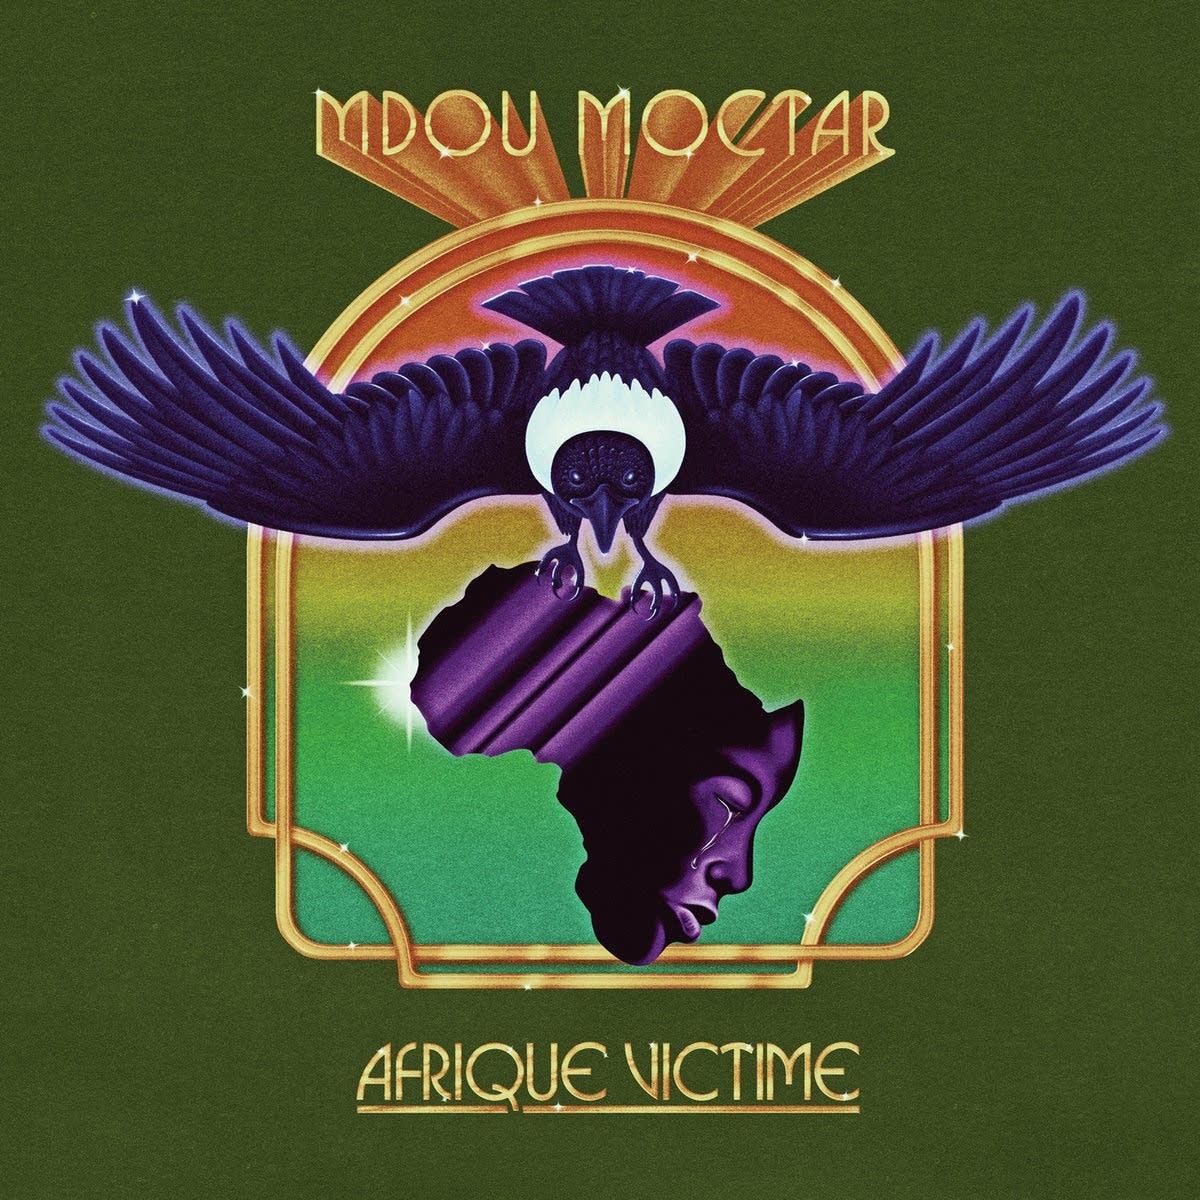 Mdou Moctar, 'Afrique Victime'